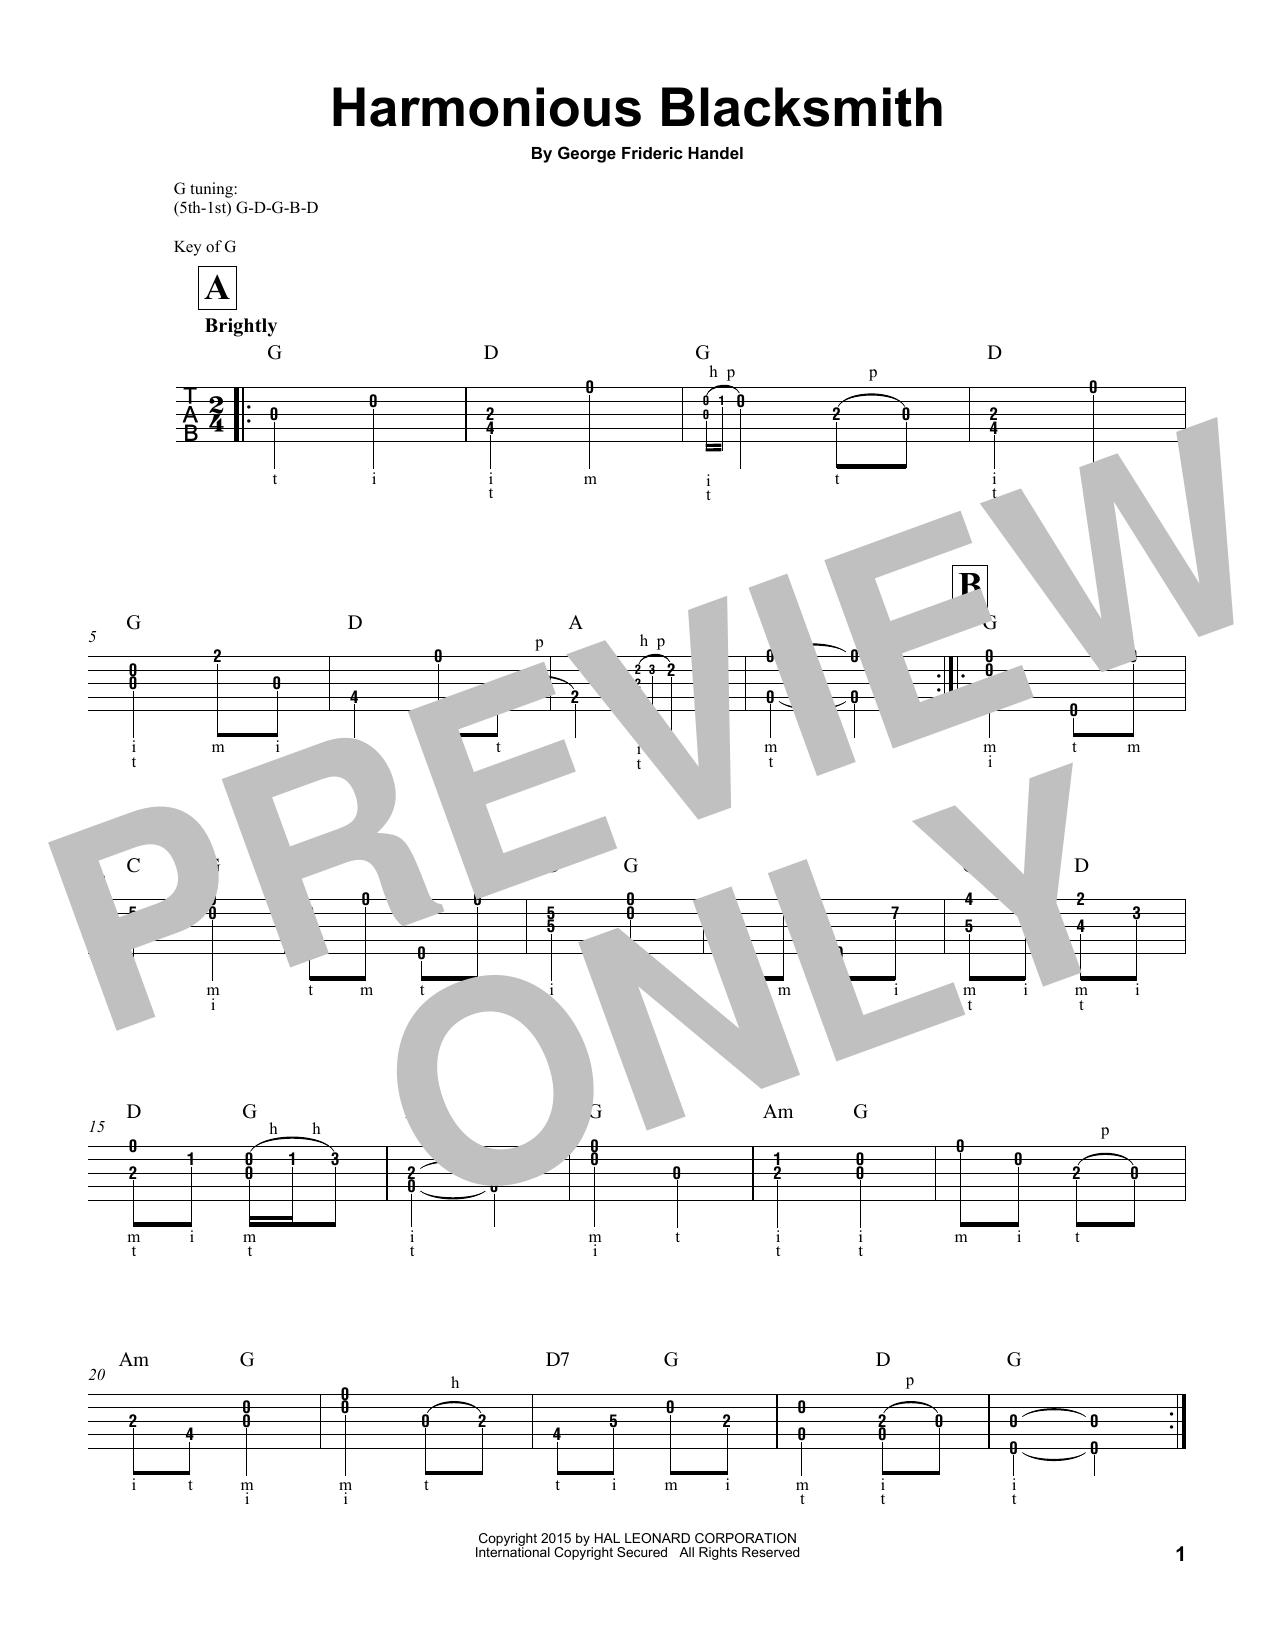 George Frideric Handel Harmonious Blacksmith sheet music notes and chords. Download Printable PDF.